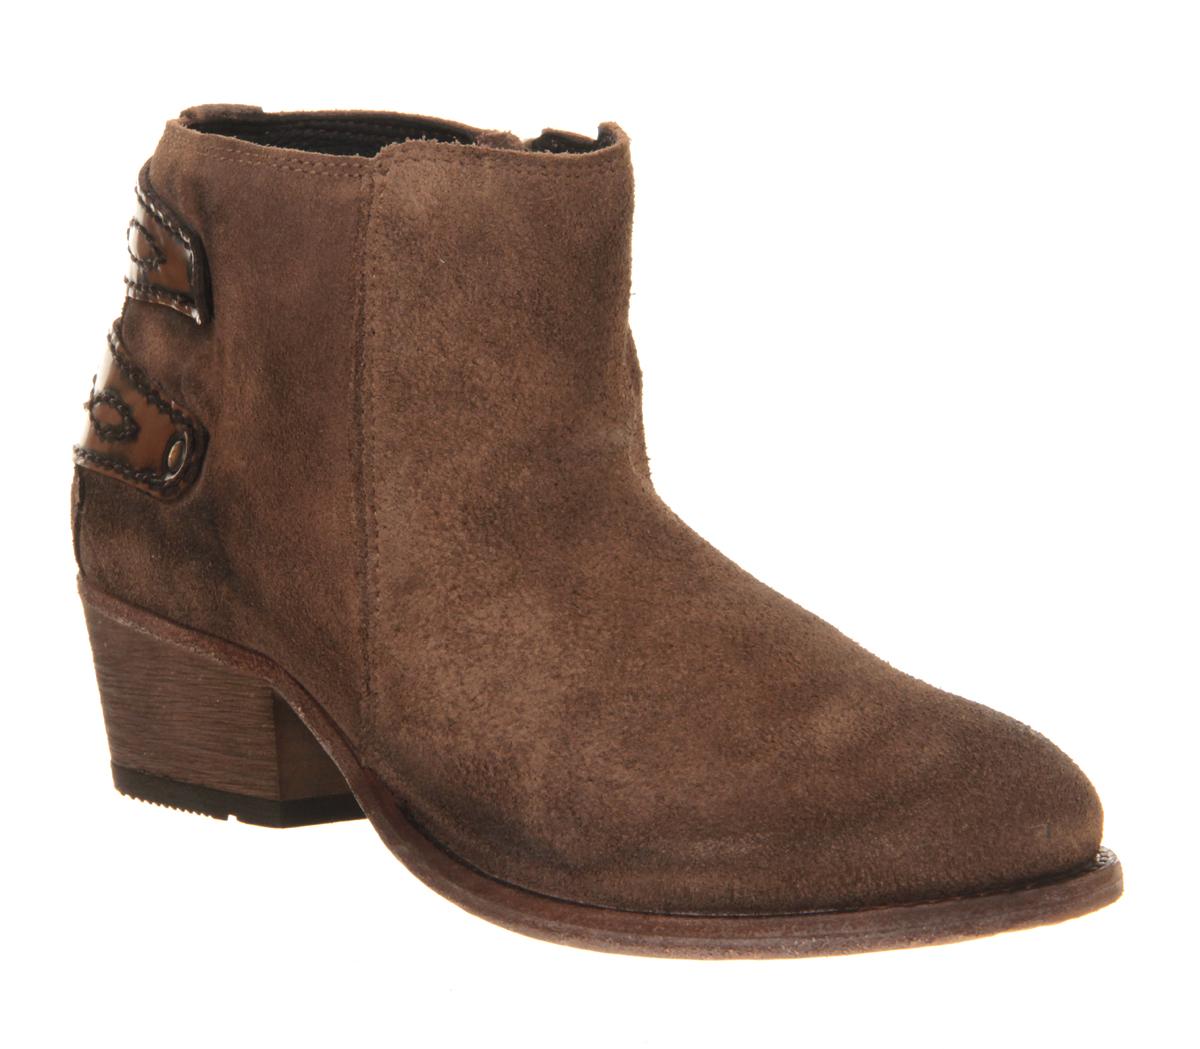 womens h by hudson rosse ankle boot beige suede boots ebay. Black Bedroom Furniture Sets. Home Design Ideas